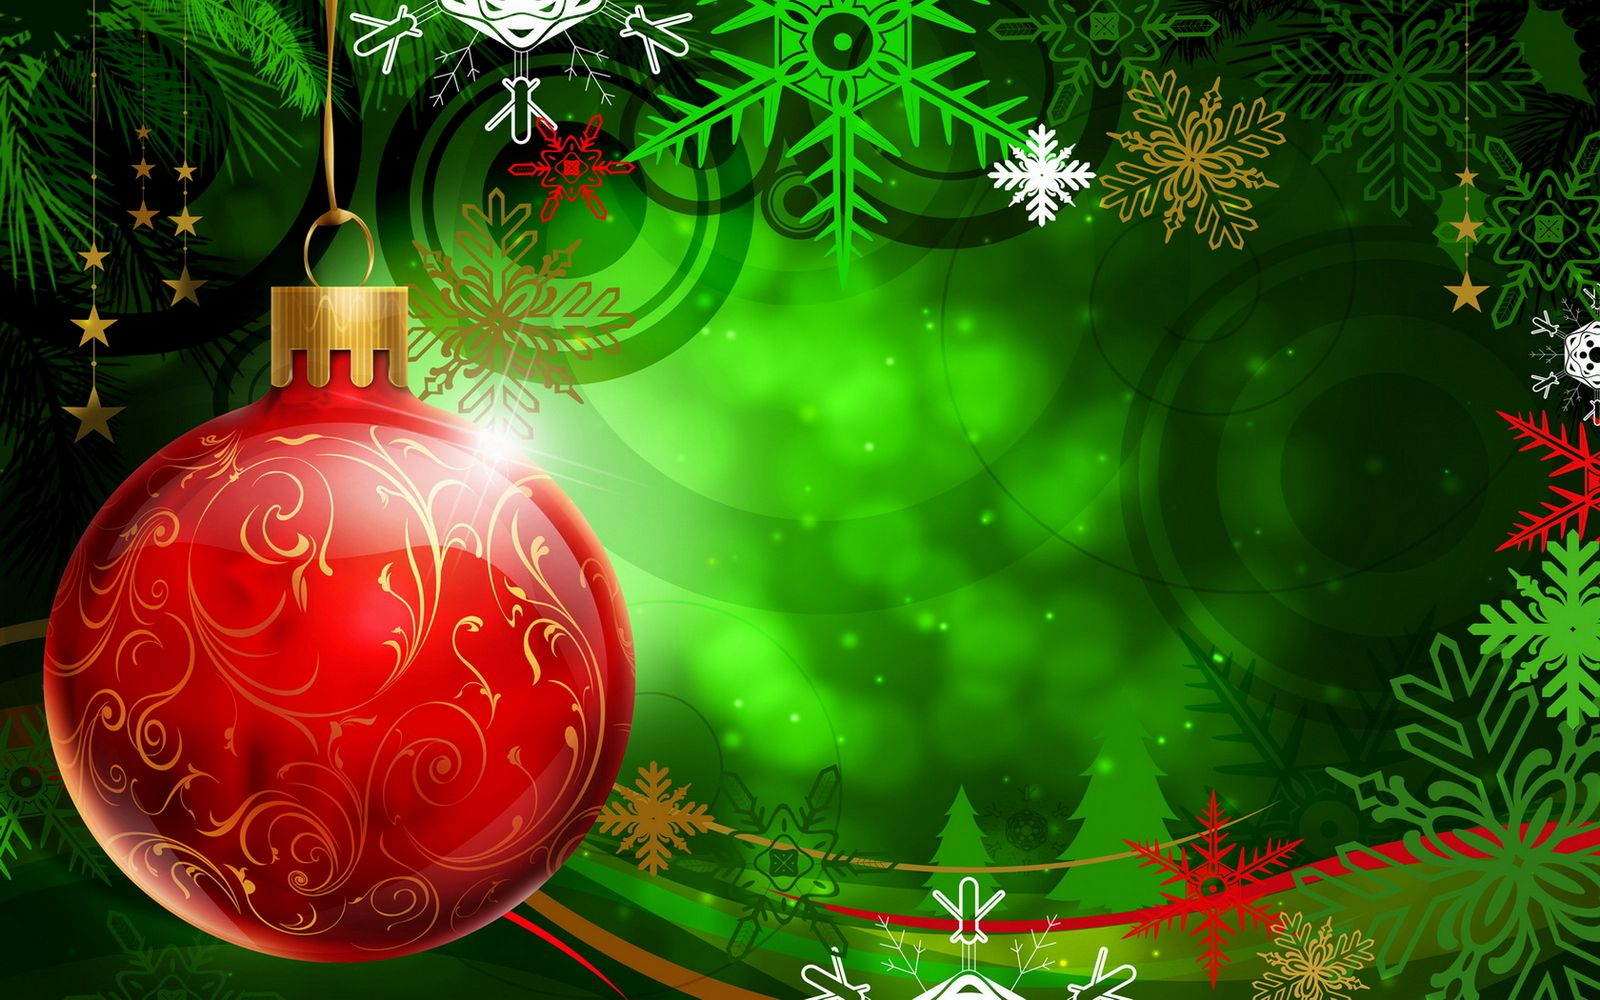 http://3.bp.blogspot.com/_CqXgXp2a15w/TOZYF7Z5PvI/AAAAAAAAOyY/tg9ycUrZmPw/s1600/christmas-ps3-wallpaper.jpg